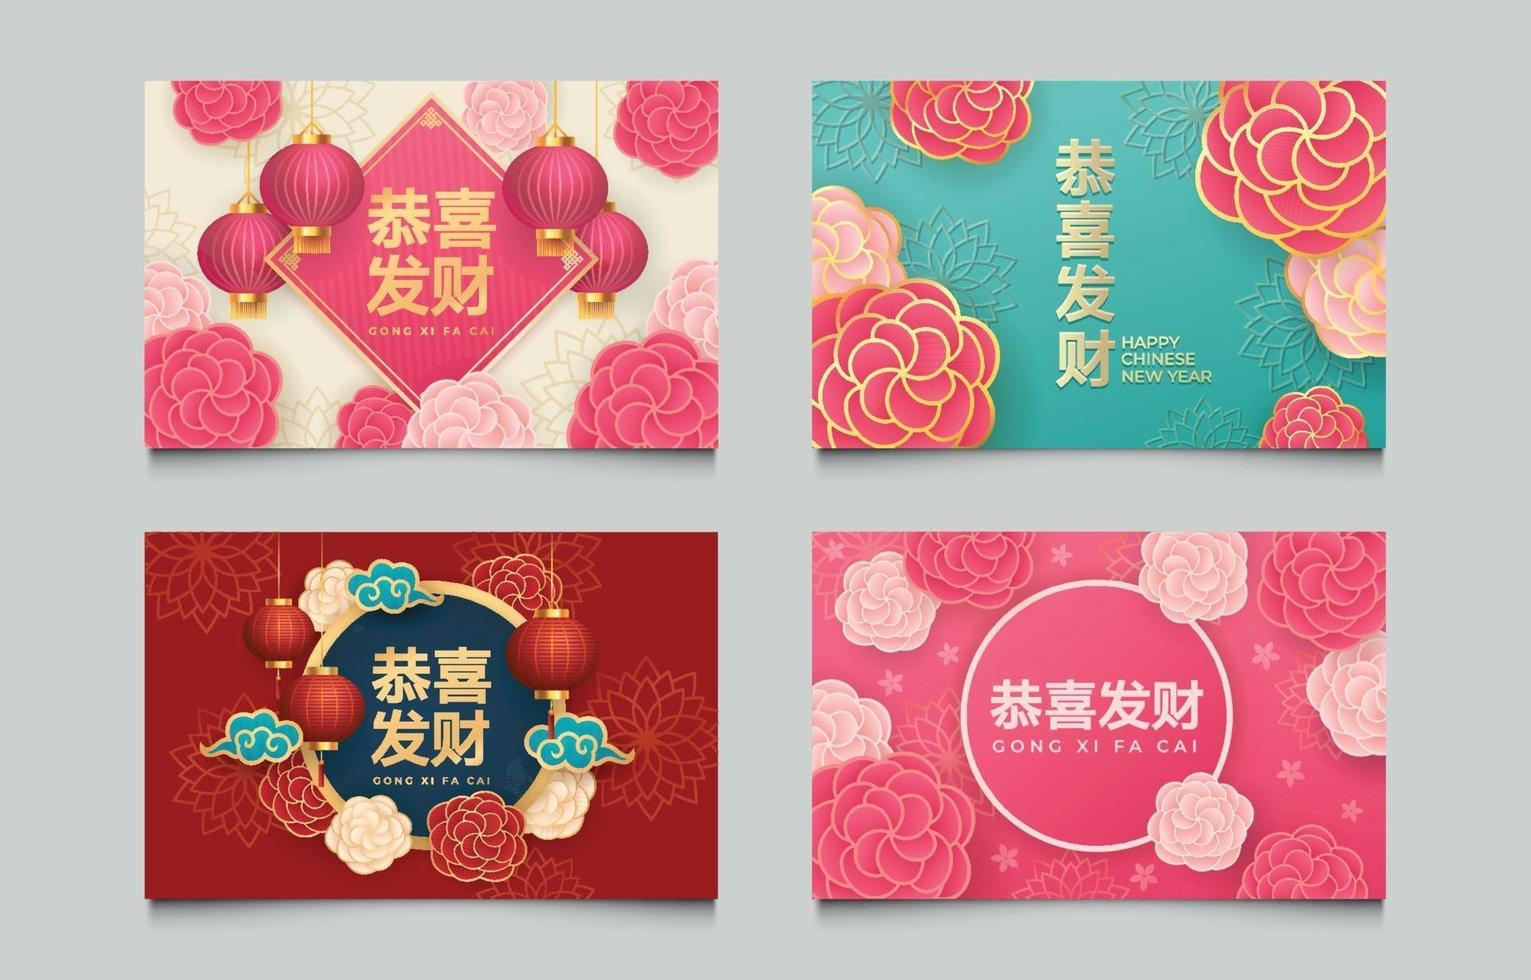 ensemble de carte de nouvel an chinois écrite en chinois vecteur